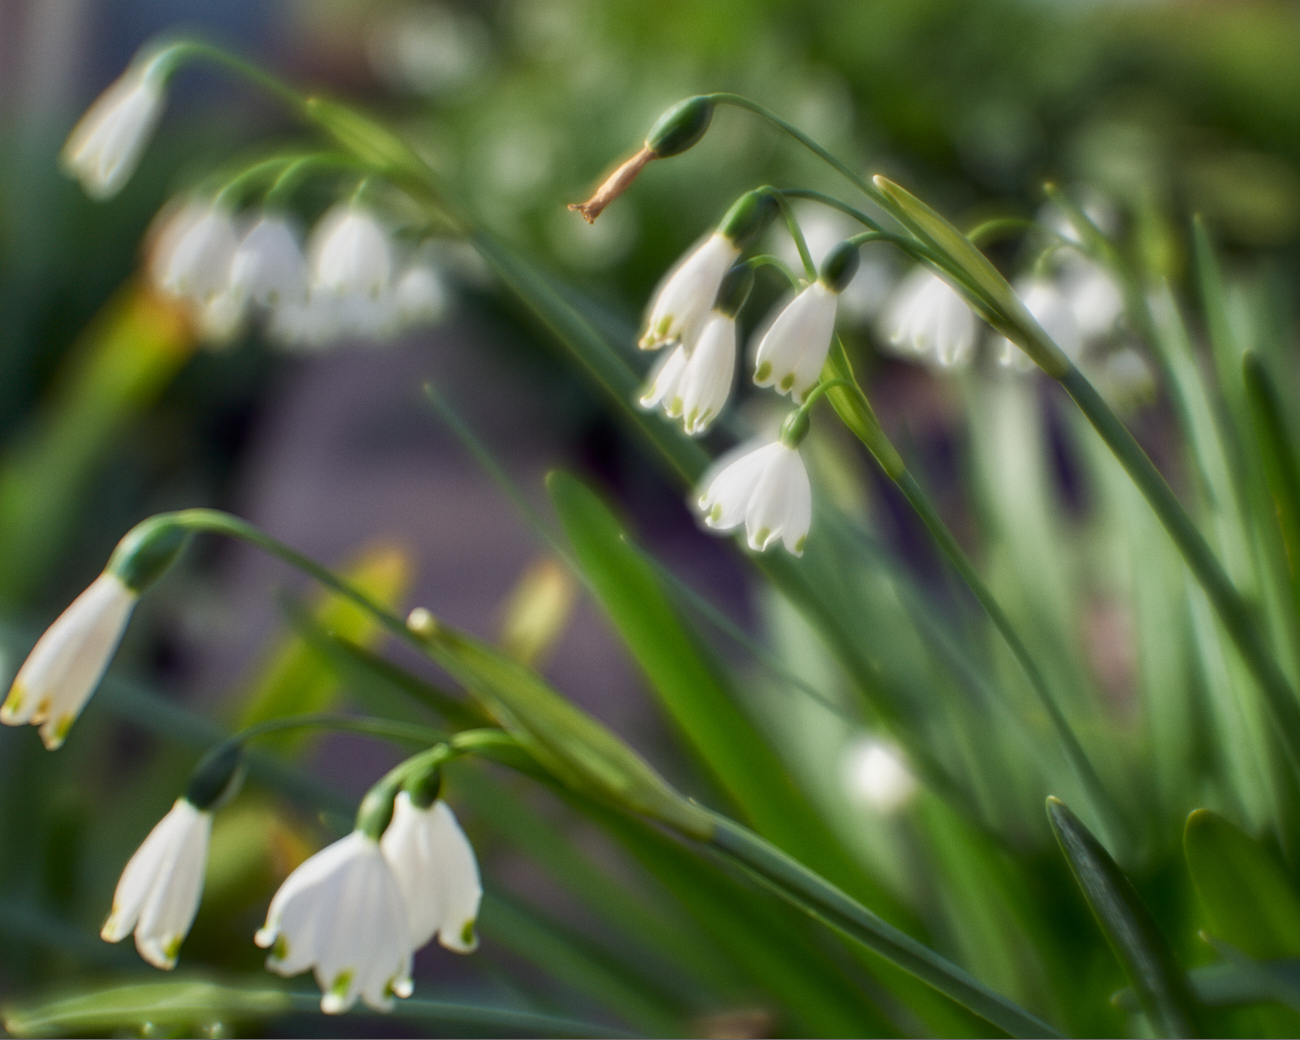 monocle flower